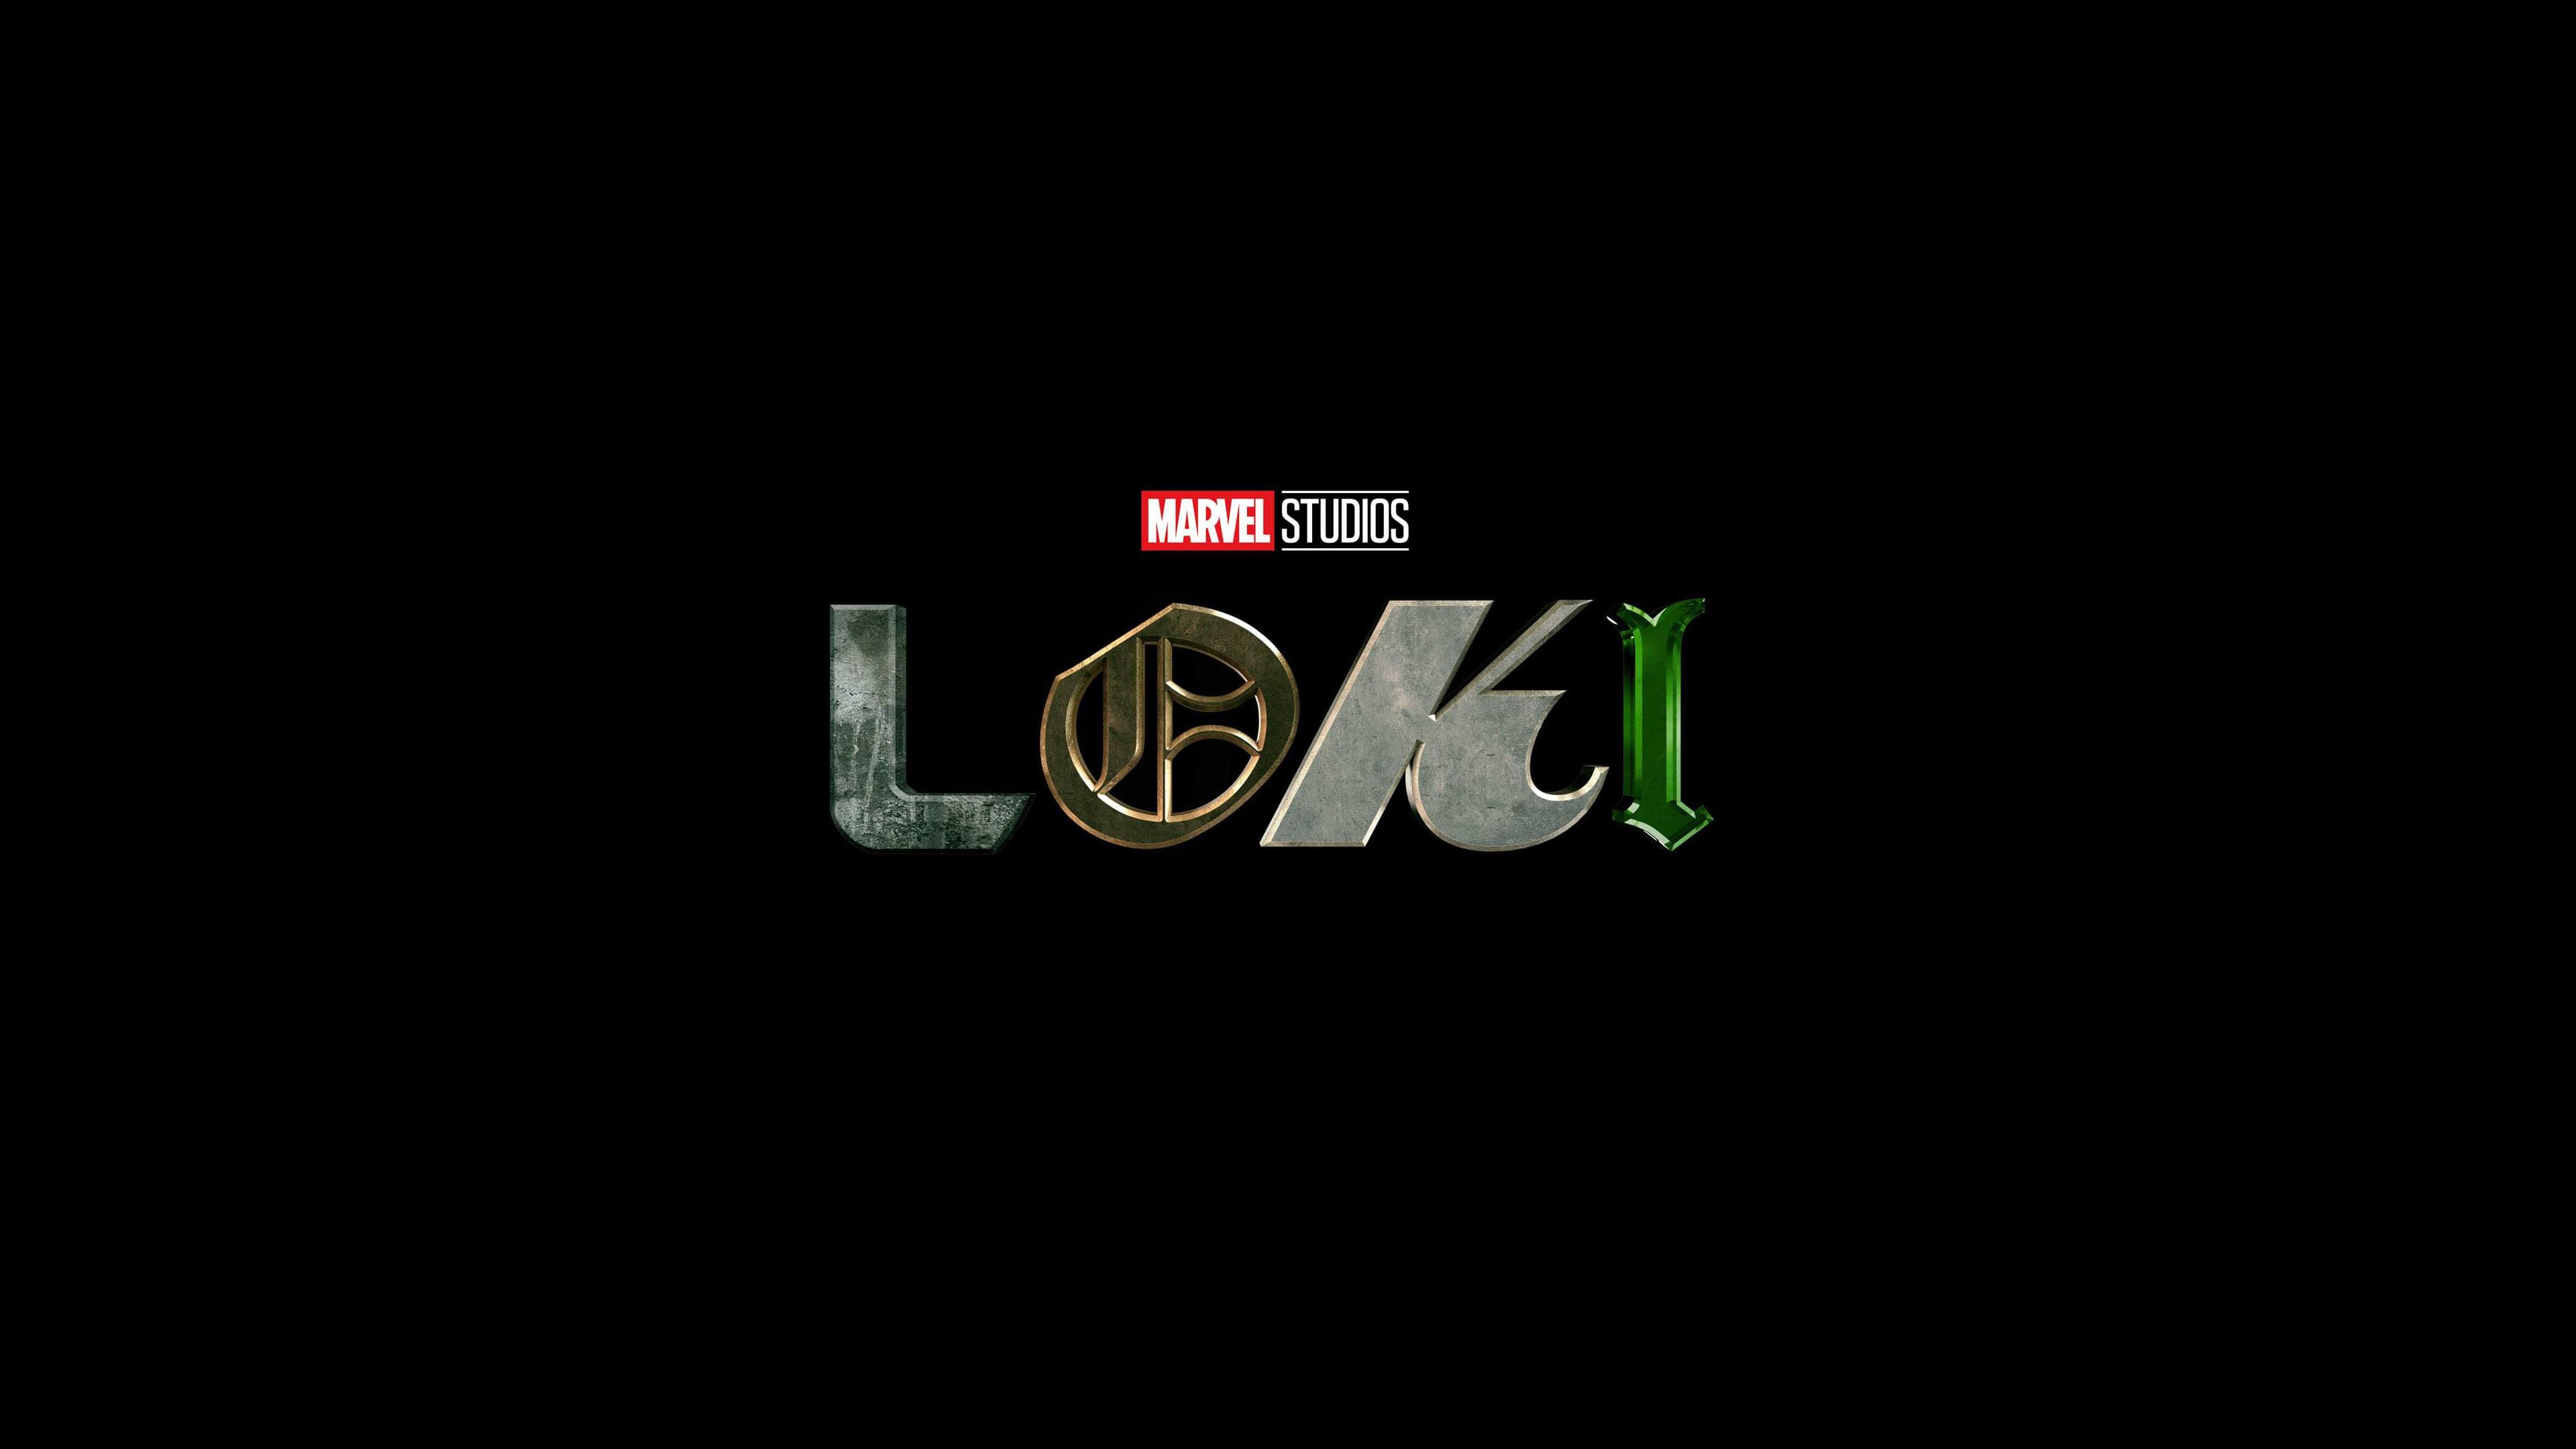 1360x768 Disney Plus Loki Comic Con Poster Desktop Laptop Hd Wallpaper Hd Tv Series 4k Wallpapers Images Photos And Background